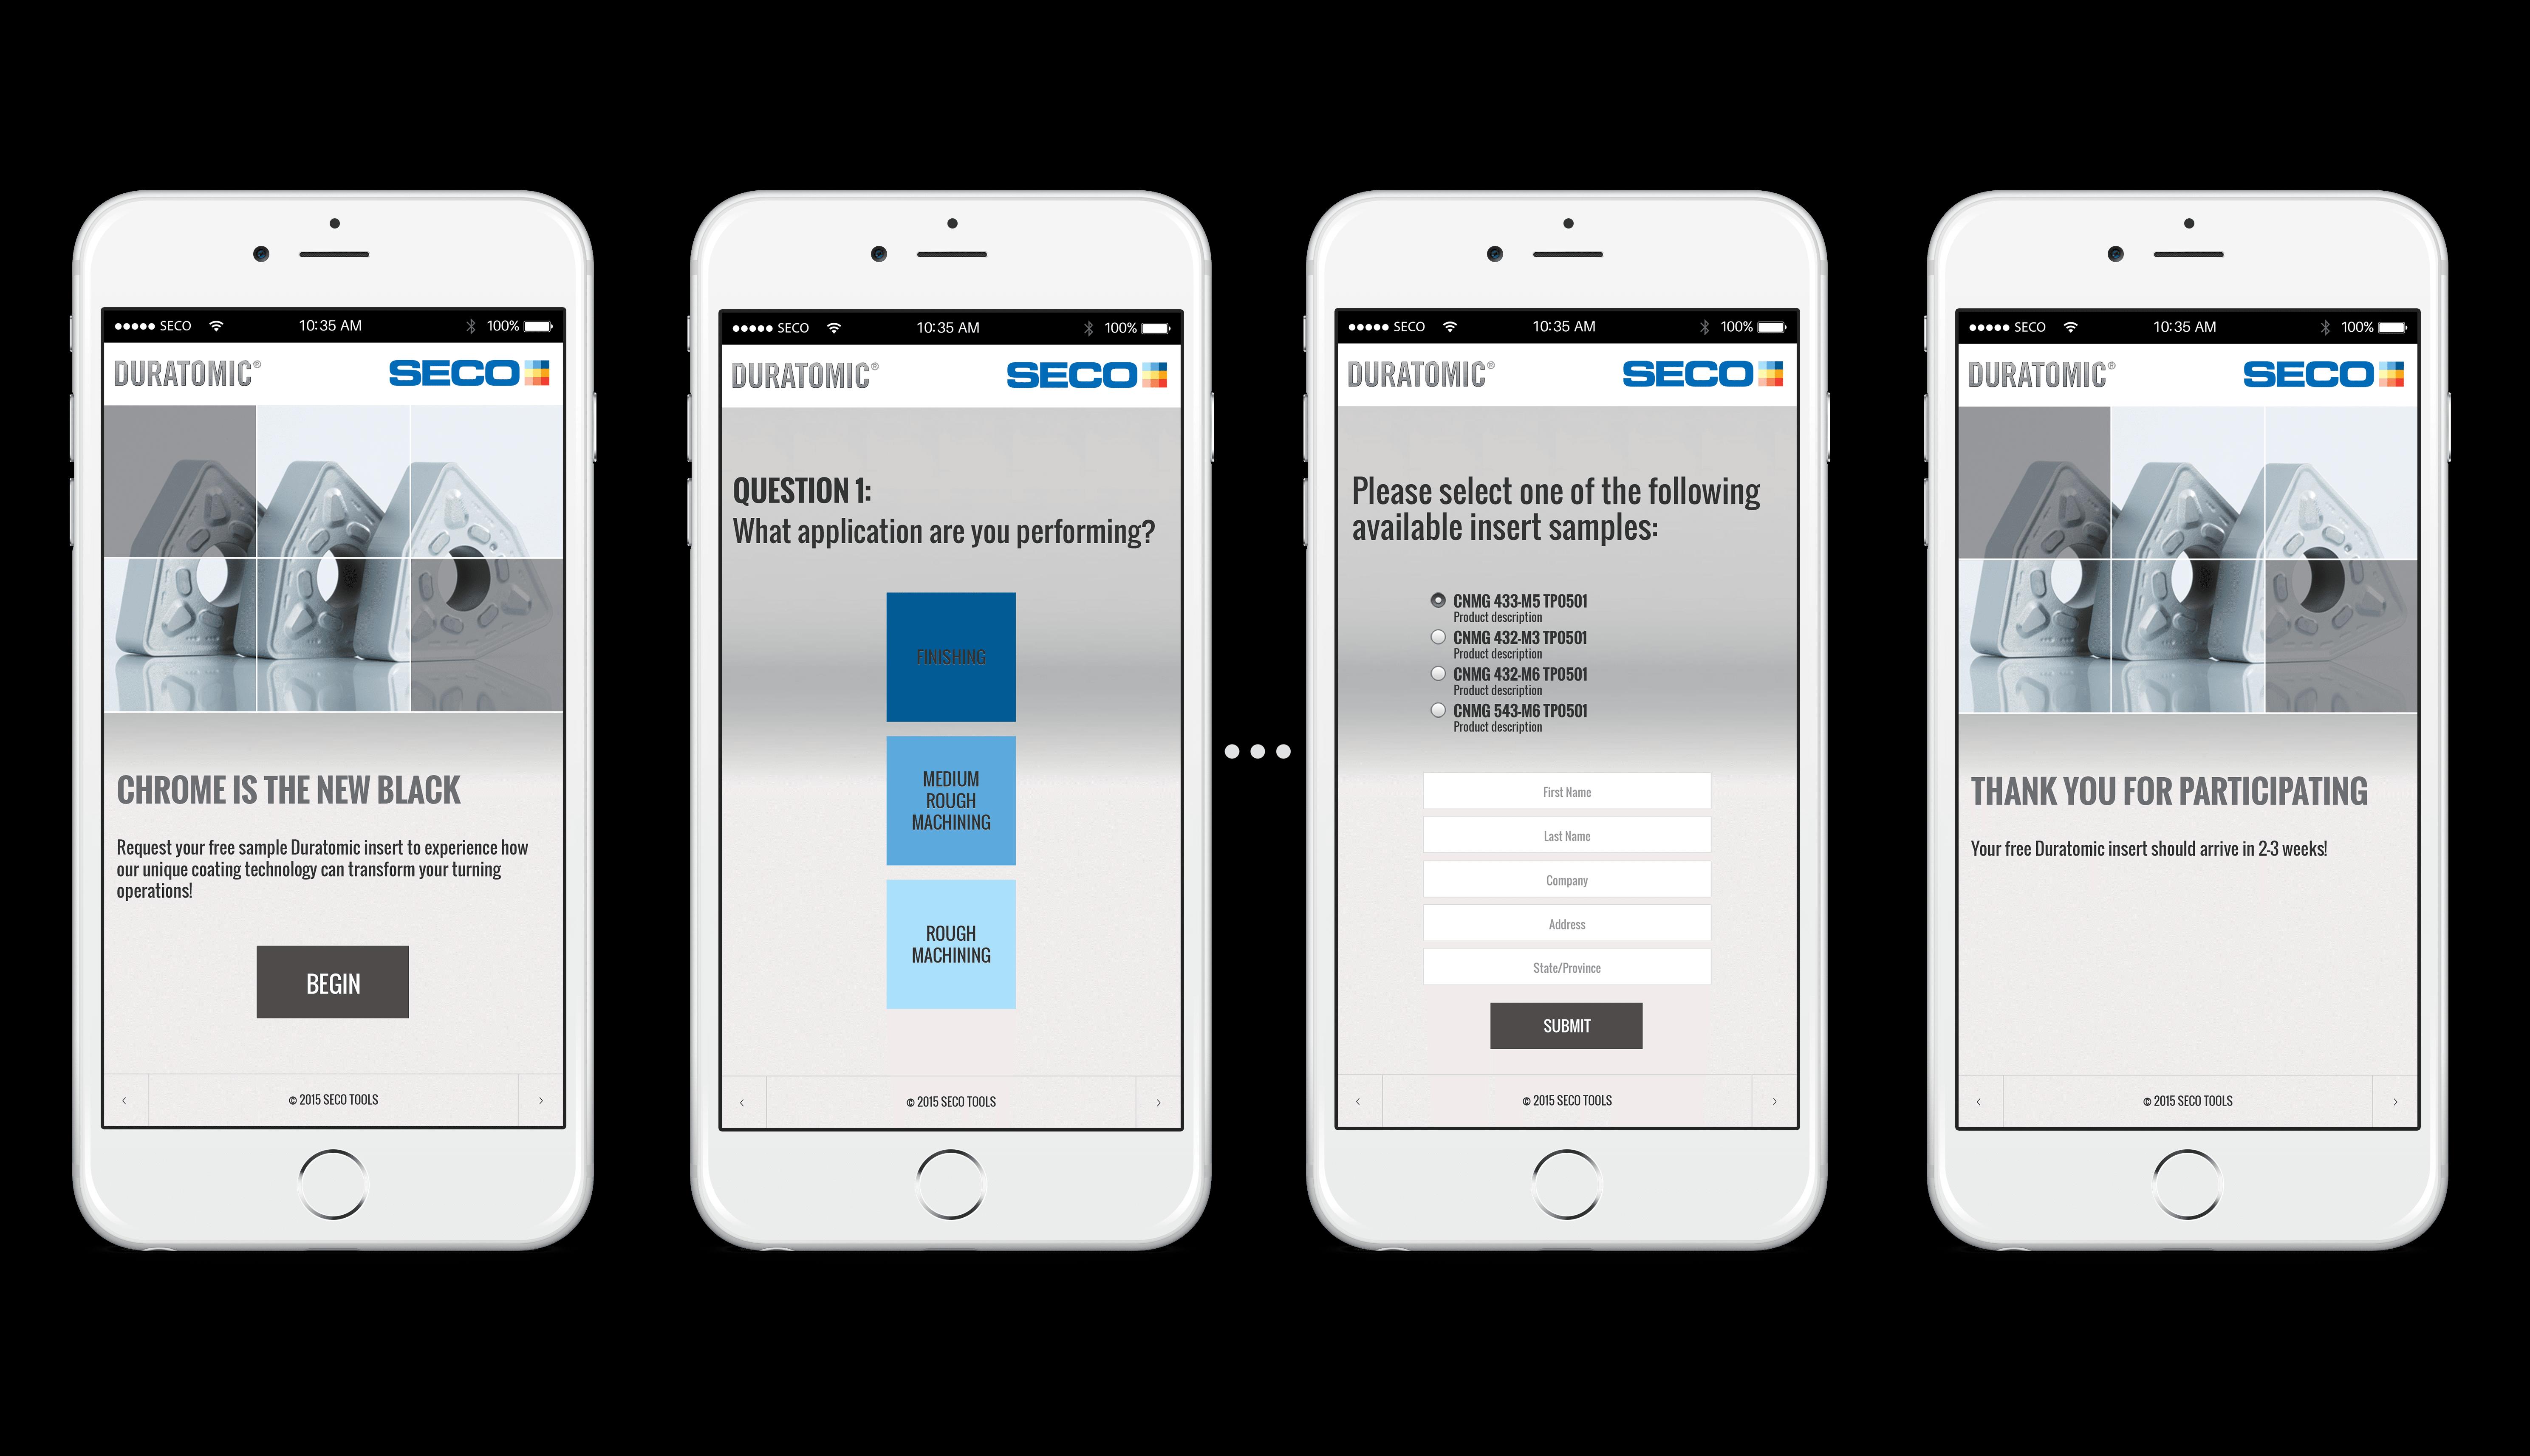 seco-duratomic-app